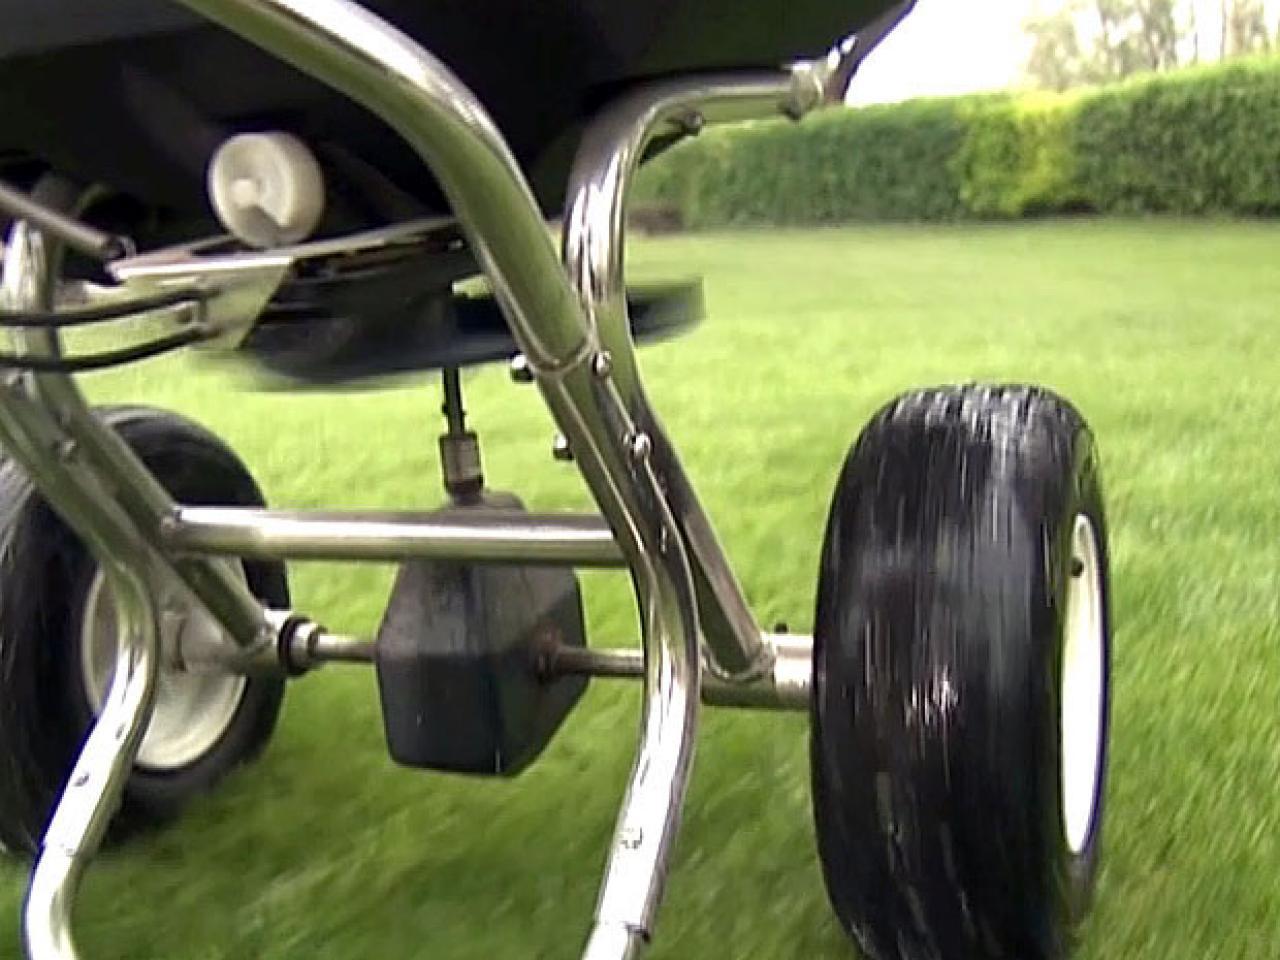 Basic Lawn Care Tips | HGTV